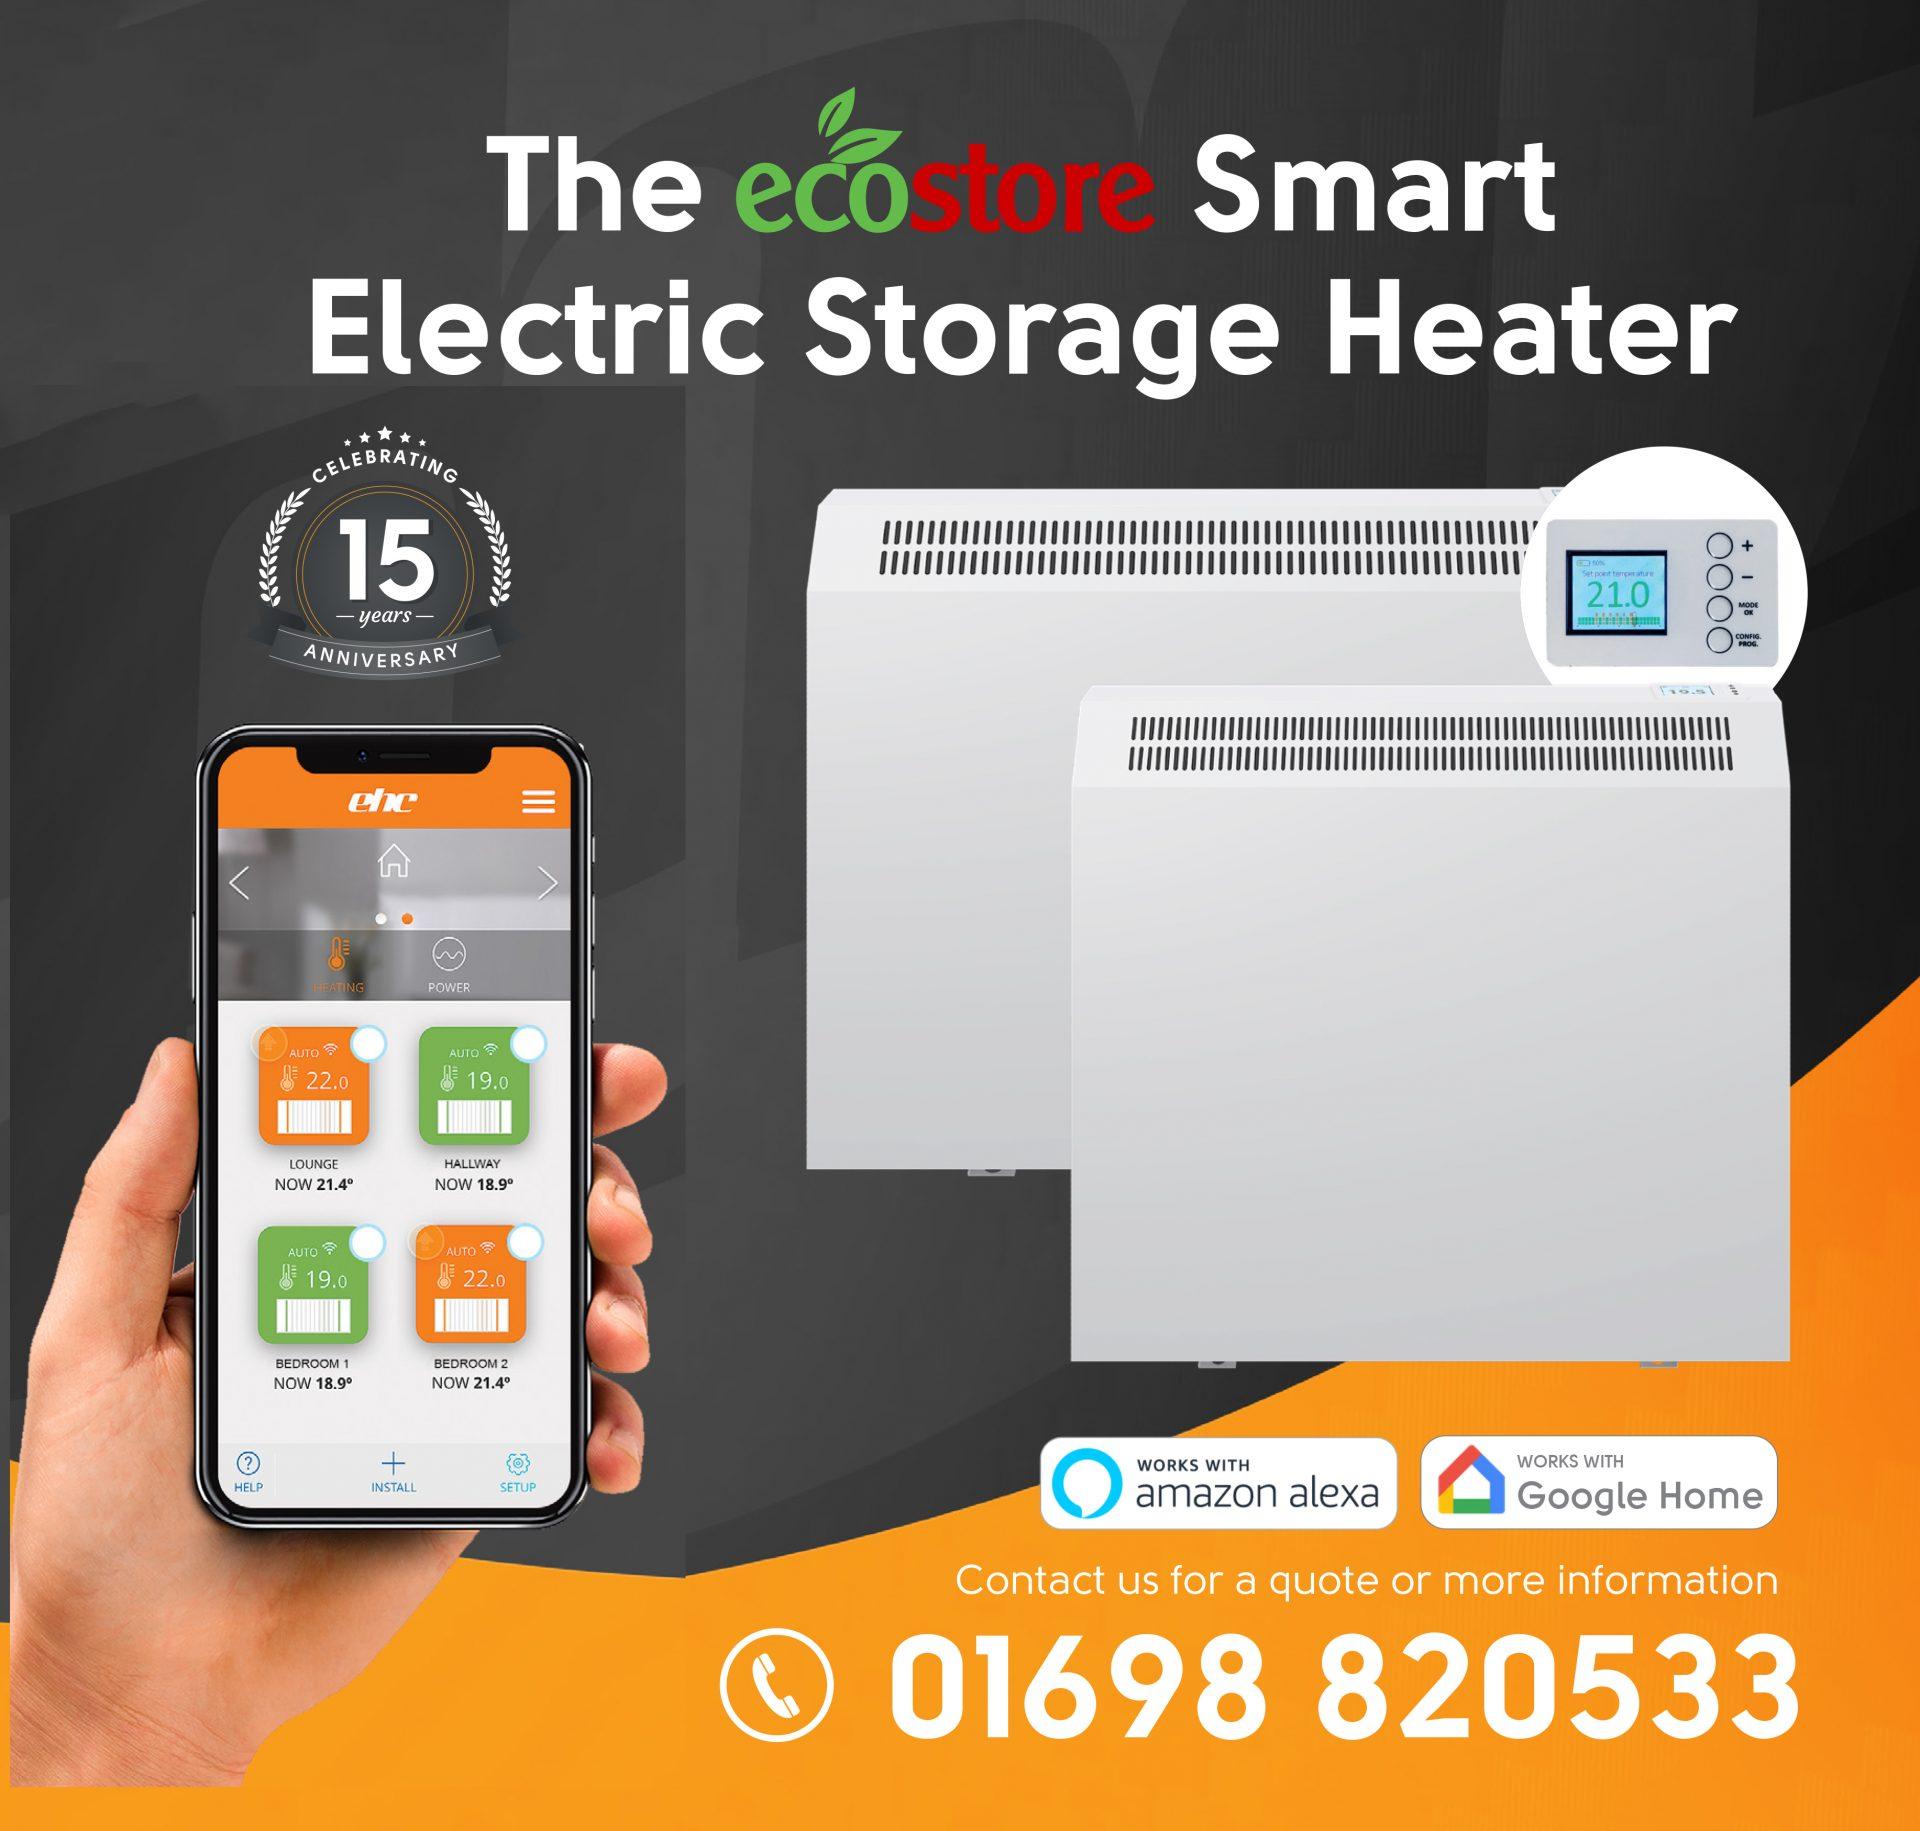 The Ecostore Smart Electric Storage Heater